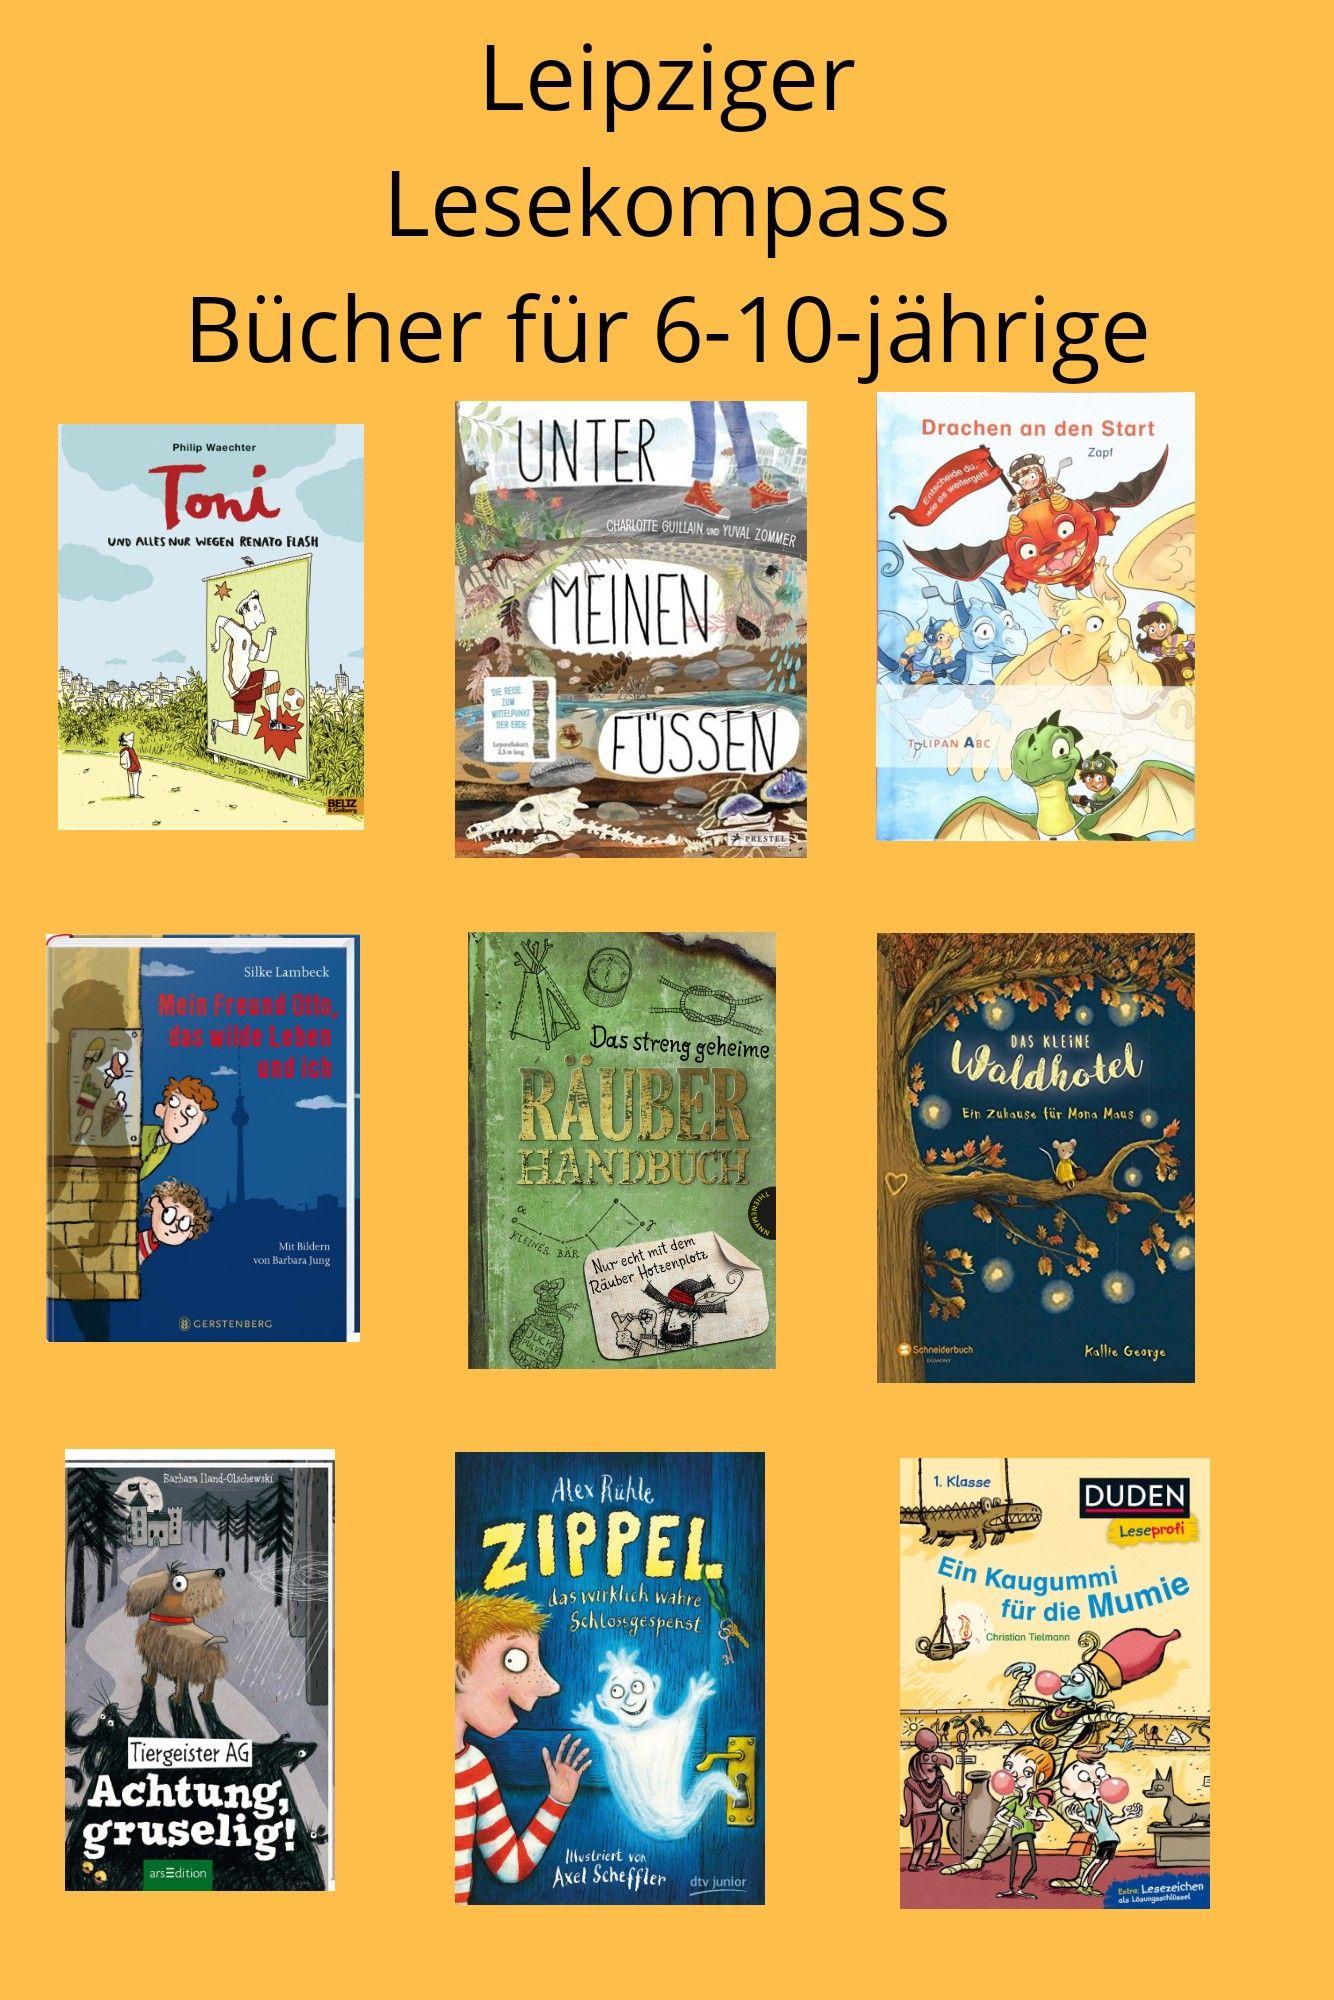 Leipziger Lesekompass Kategorie 6 10 Jahre Bucher Bilderbuch Buch Tipps